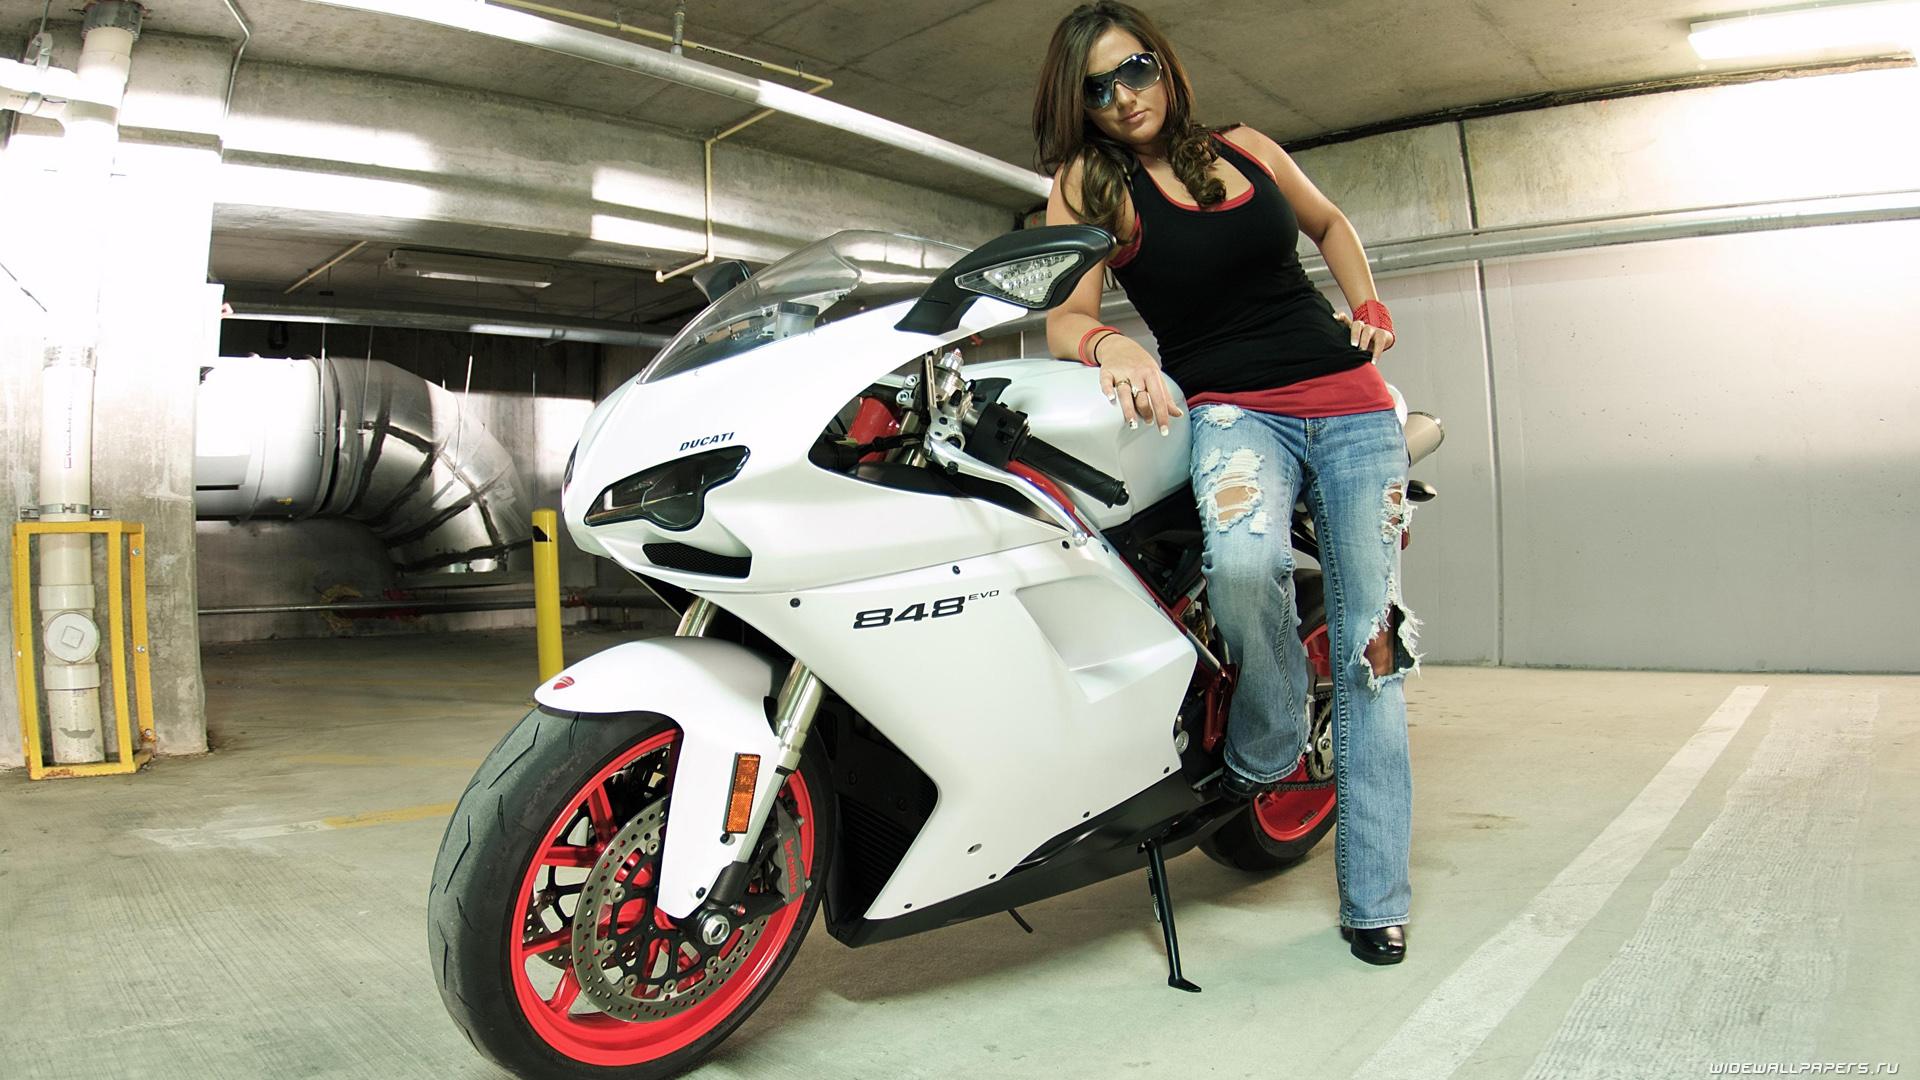 Motorcycle Wallpaper Girl Hd